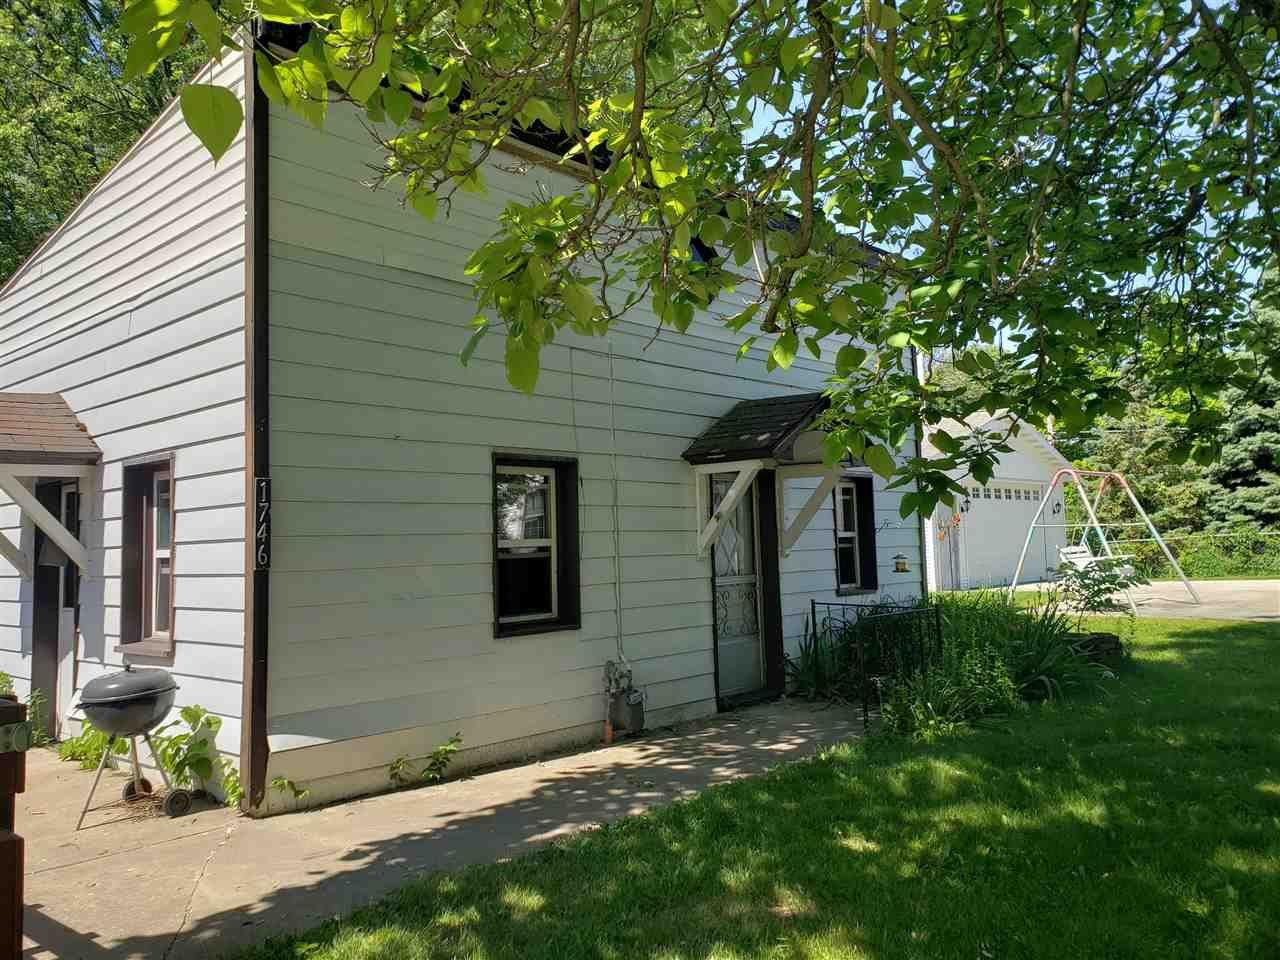 1746 LOST Lane, Green Bay, WI 54302 - MLS#: 50224000